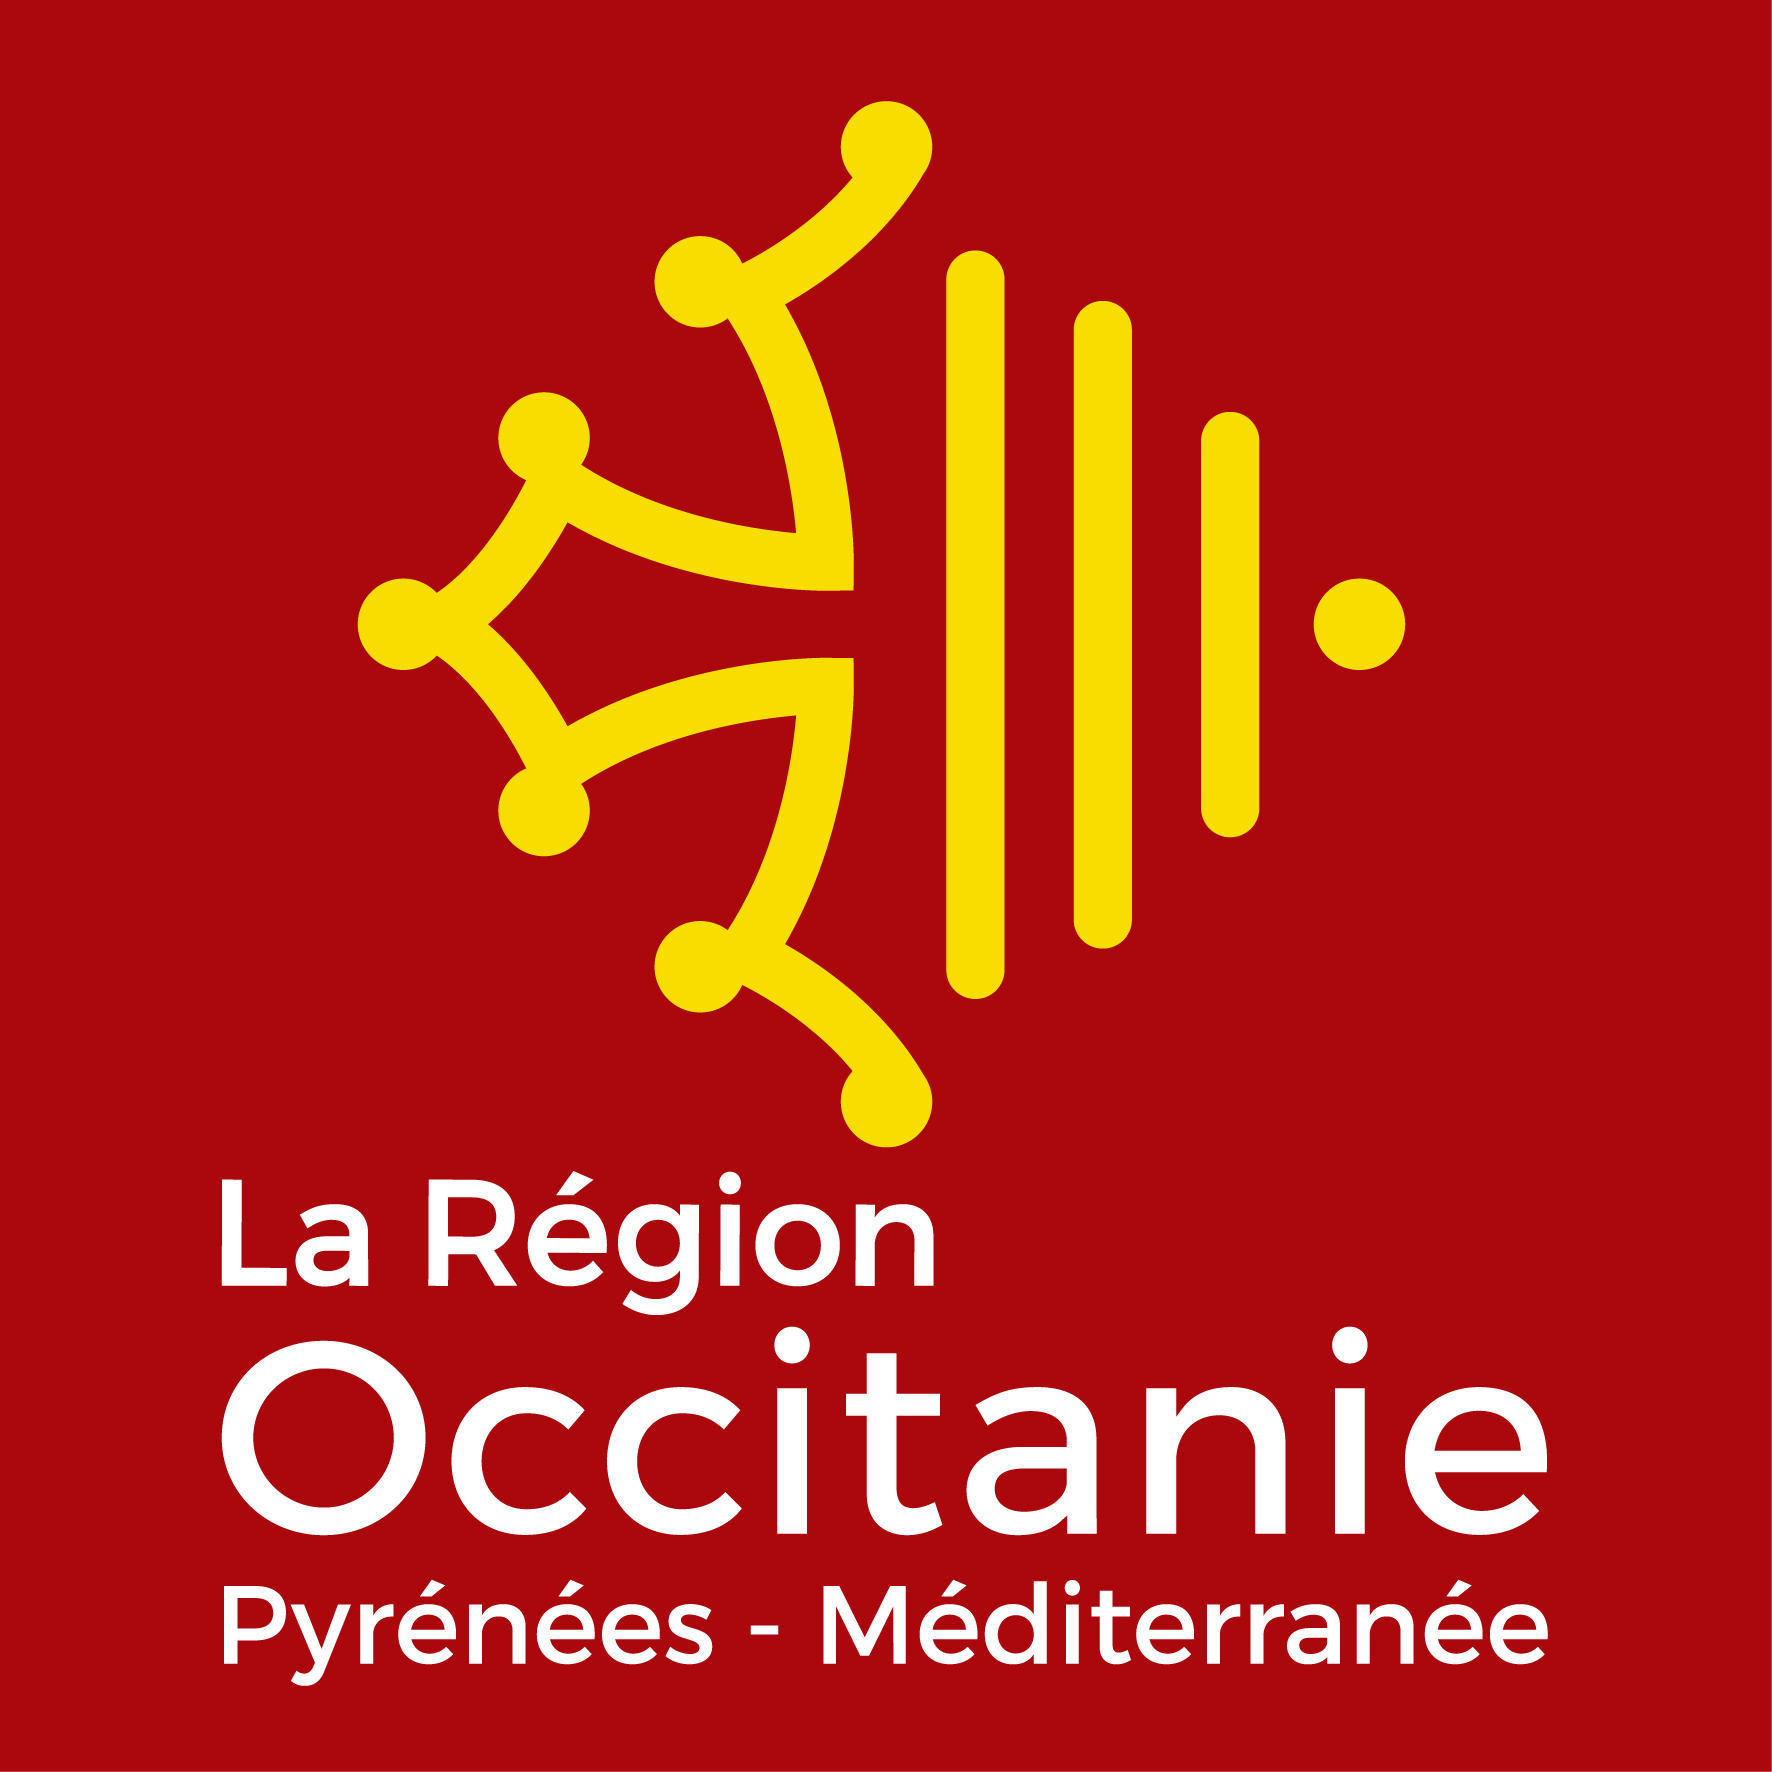 Régions Occitanie